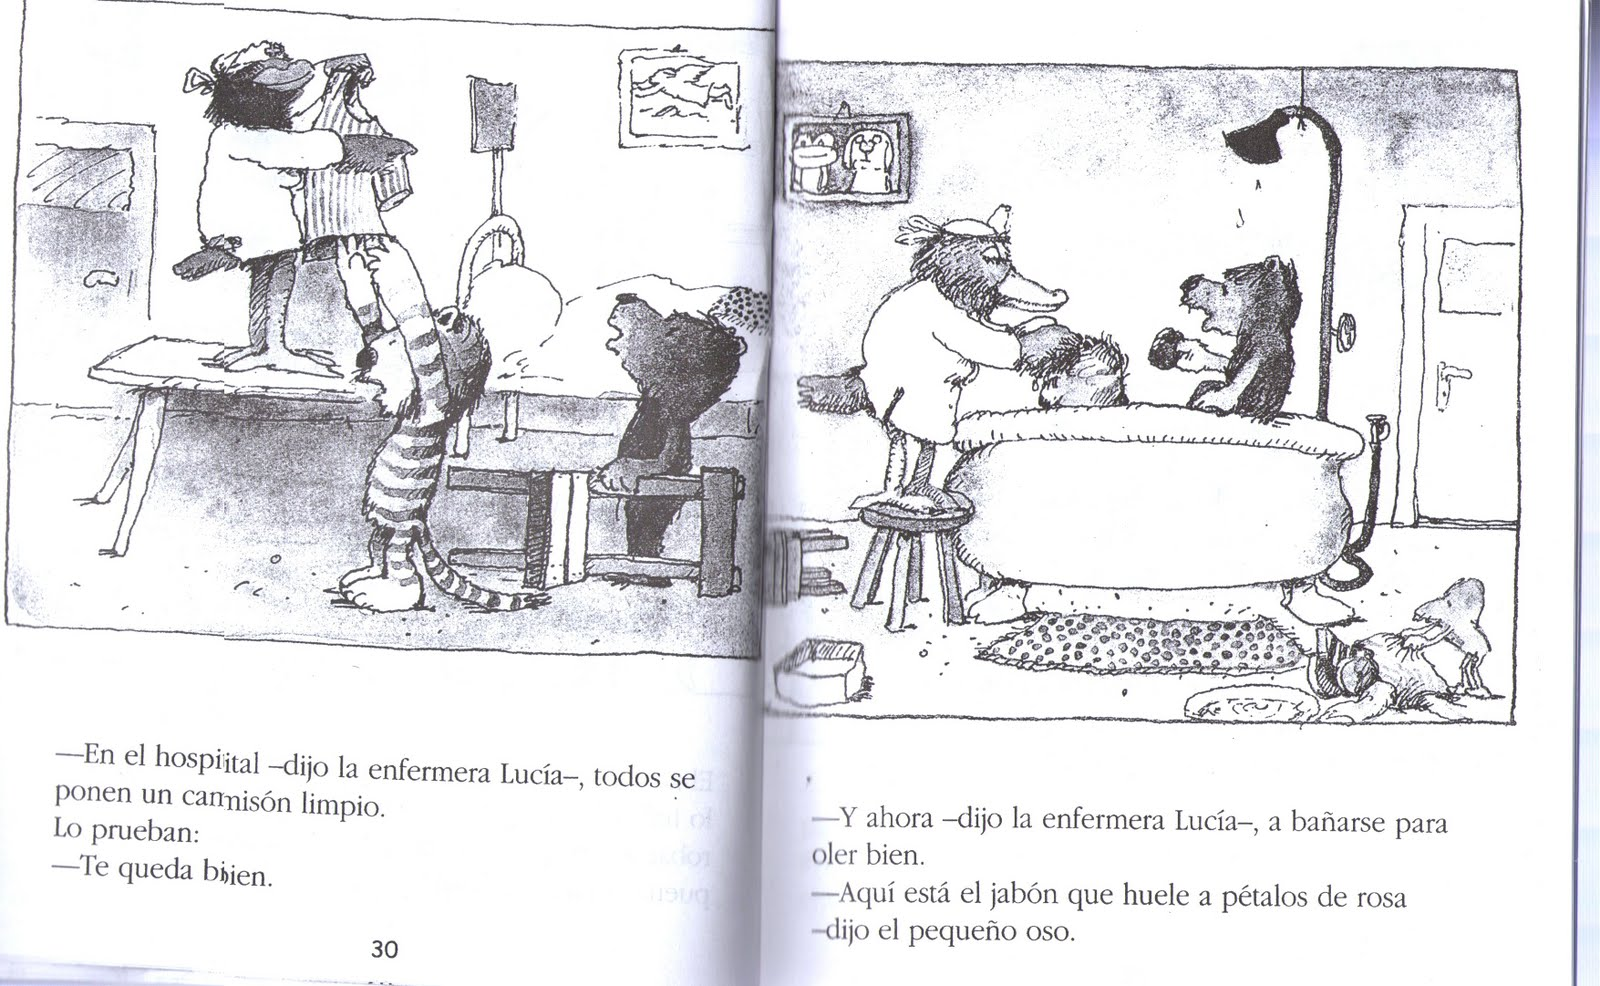 yo te curare dijo el pequeno oso: